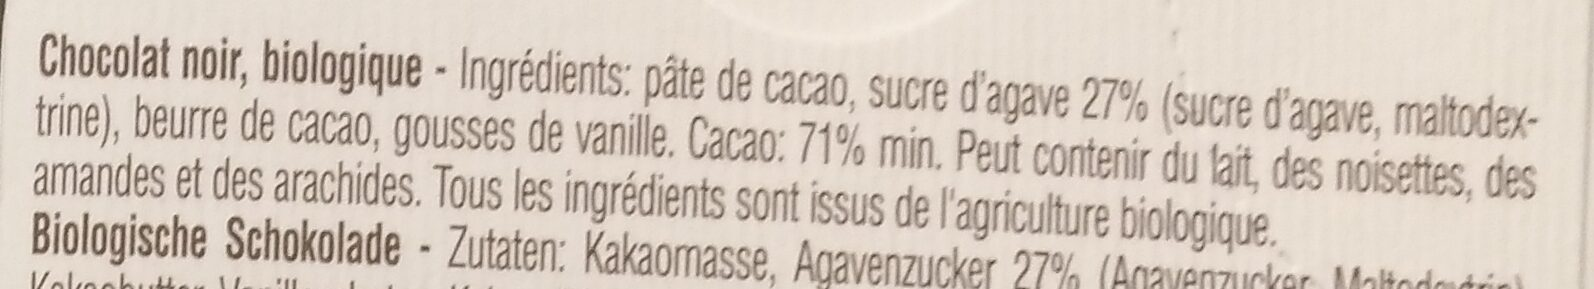 Agave Nectar, Cacao 71%, Bio & Fair - Ingredients - fr